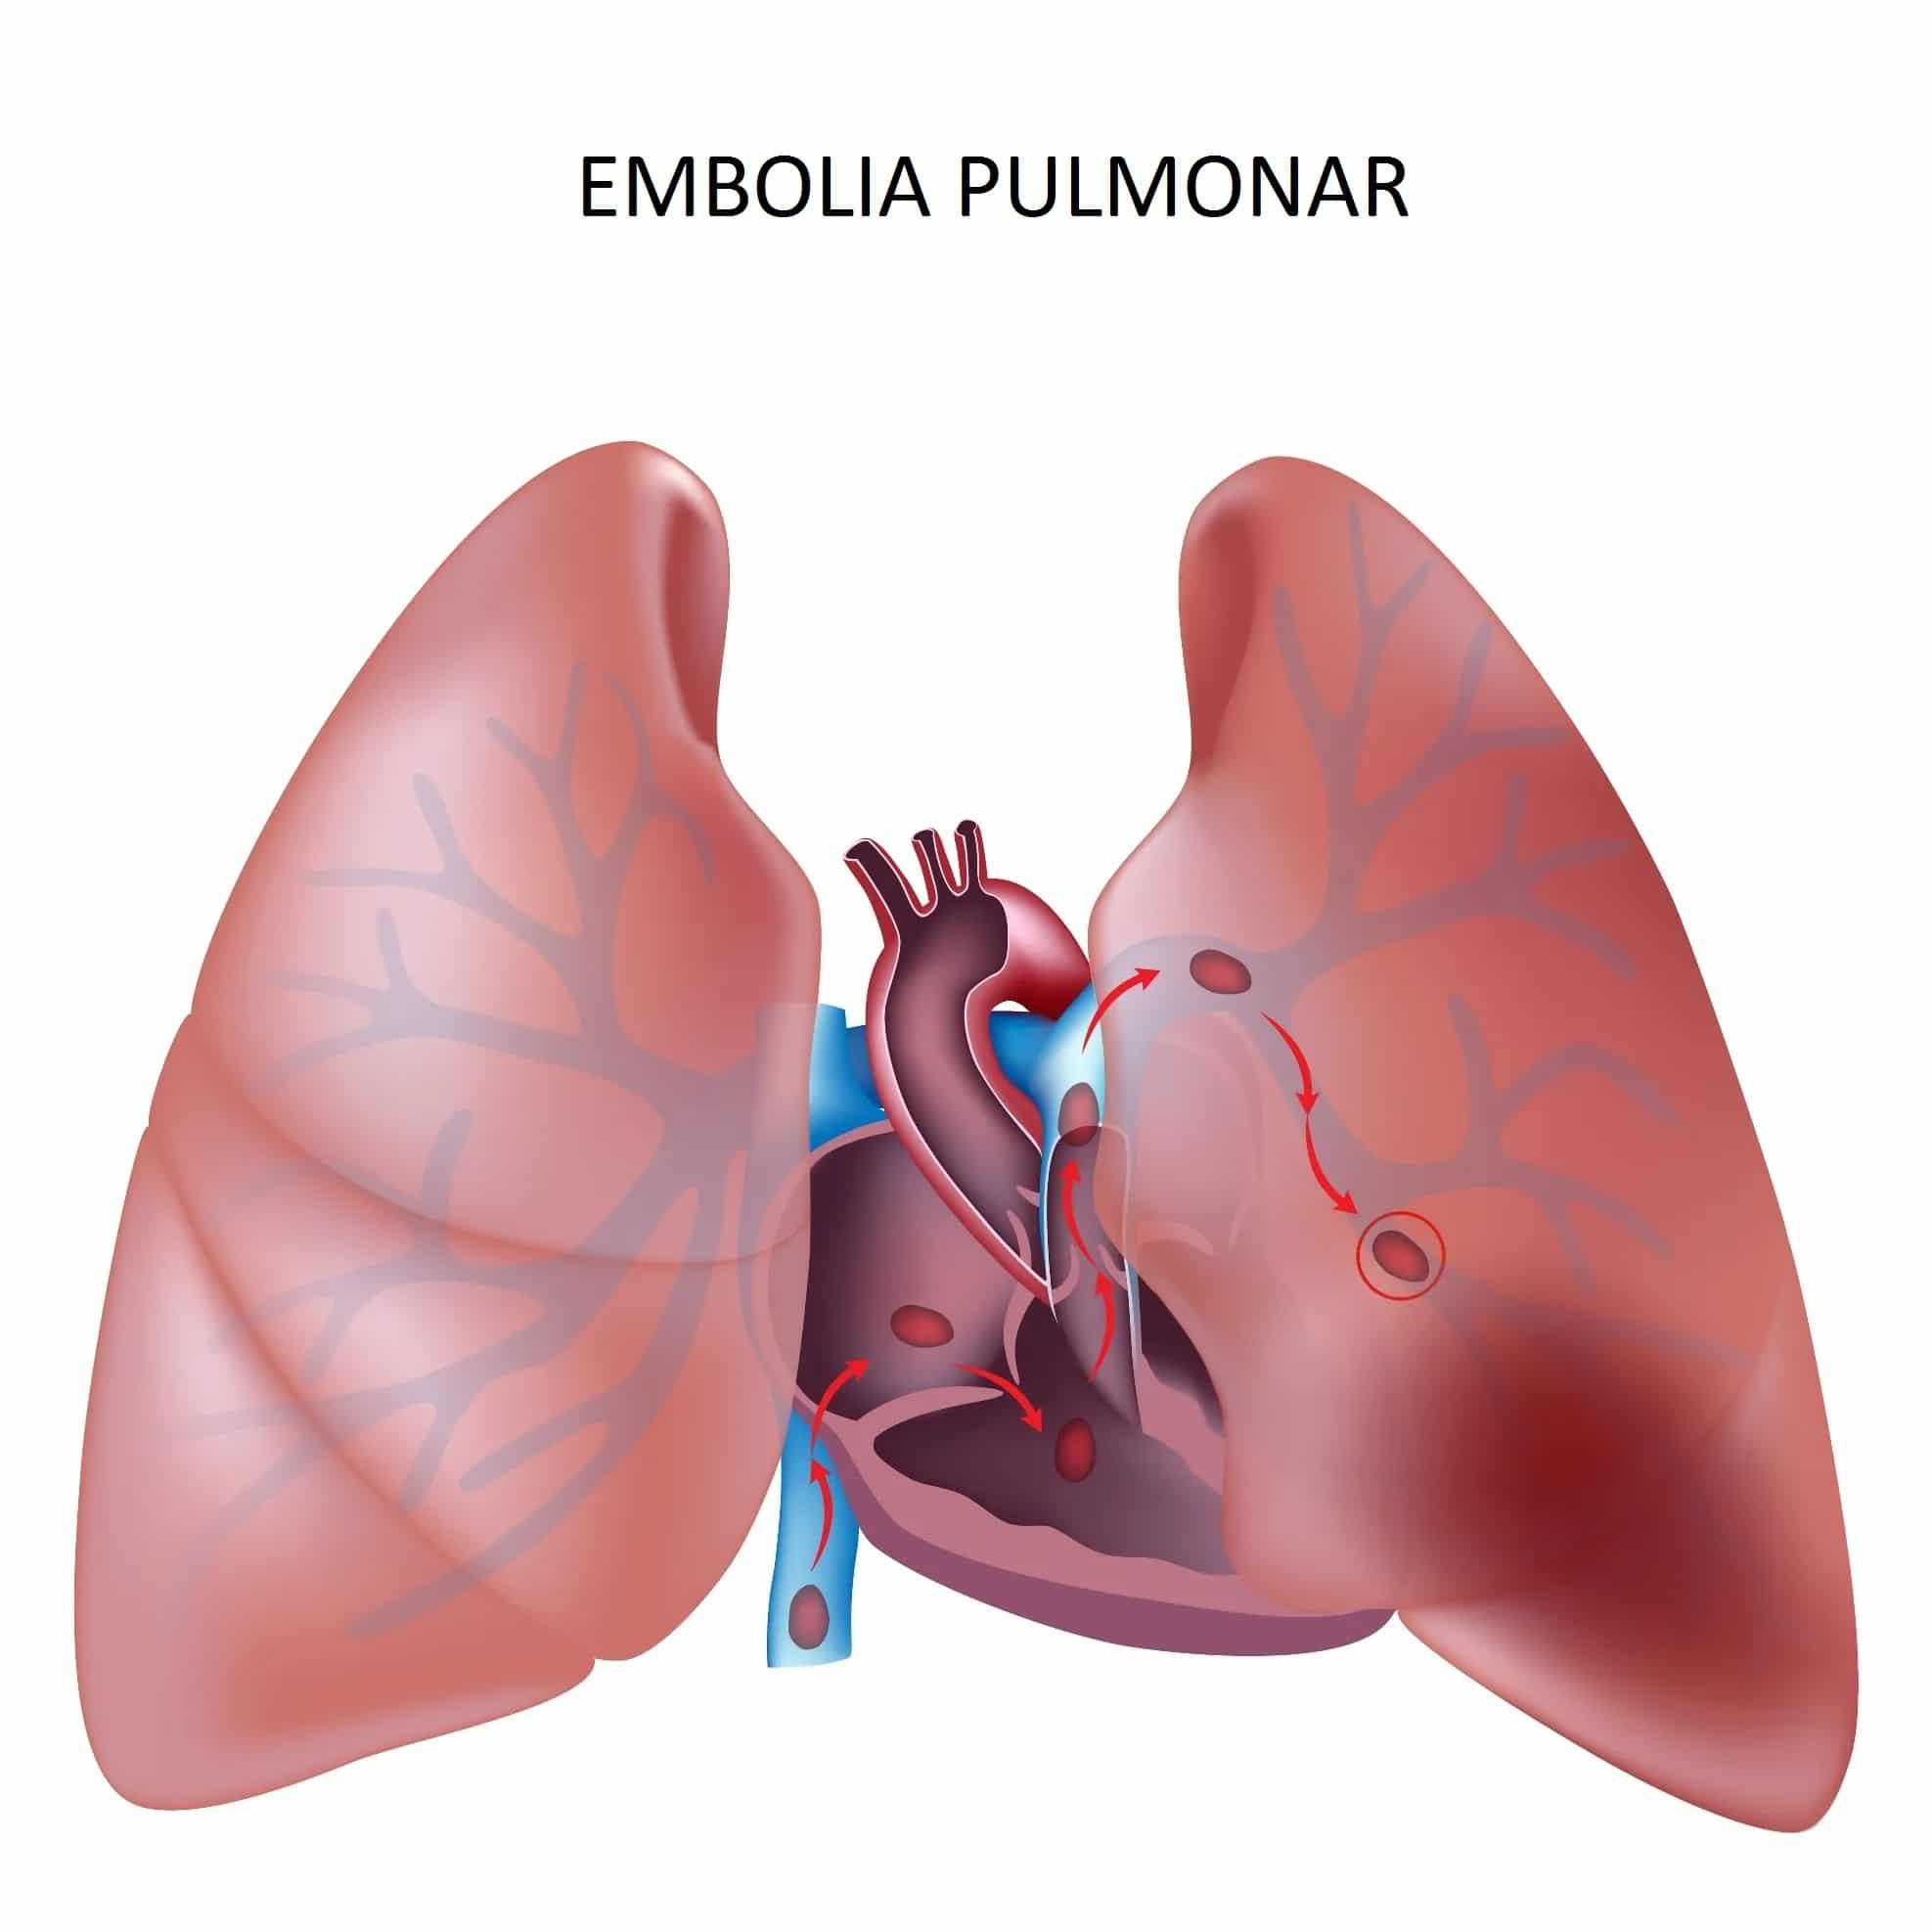 Embolia Pulmonar